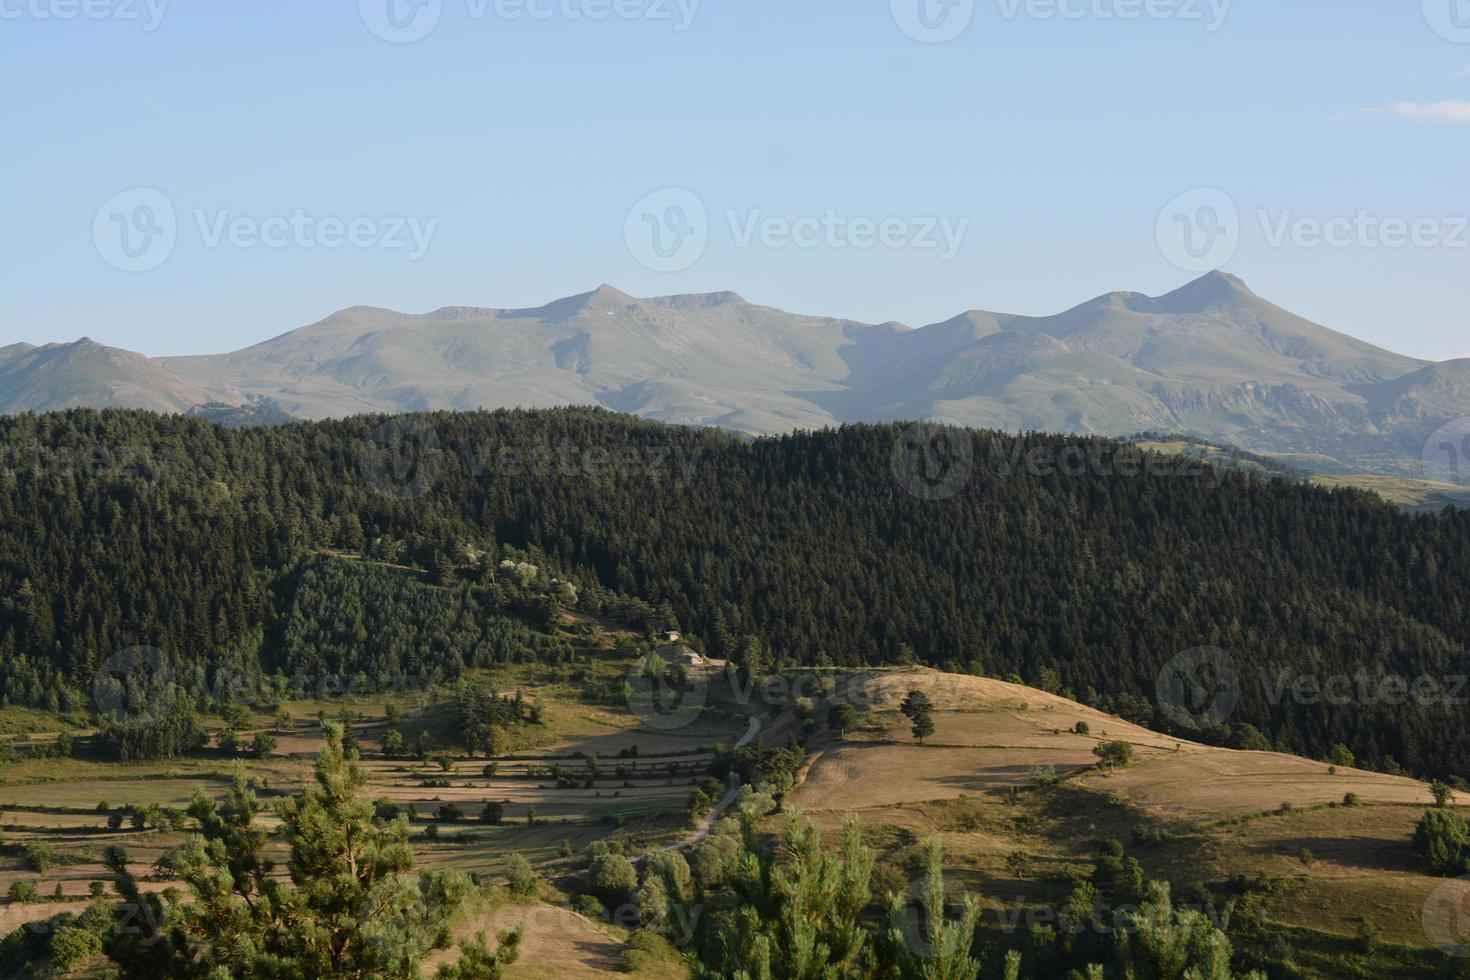 paesaggio montuoso artvin foto